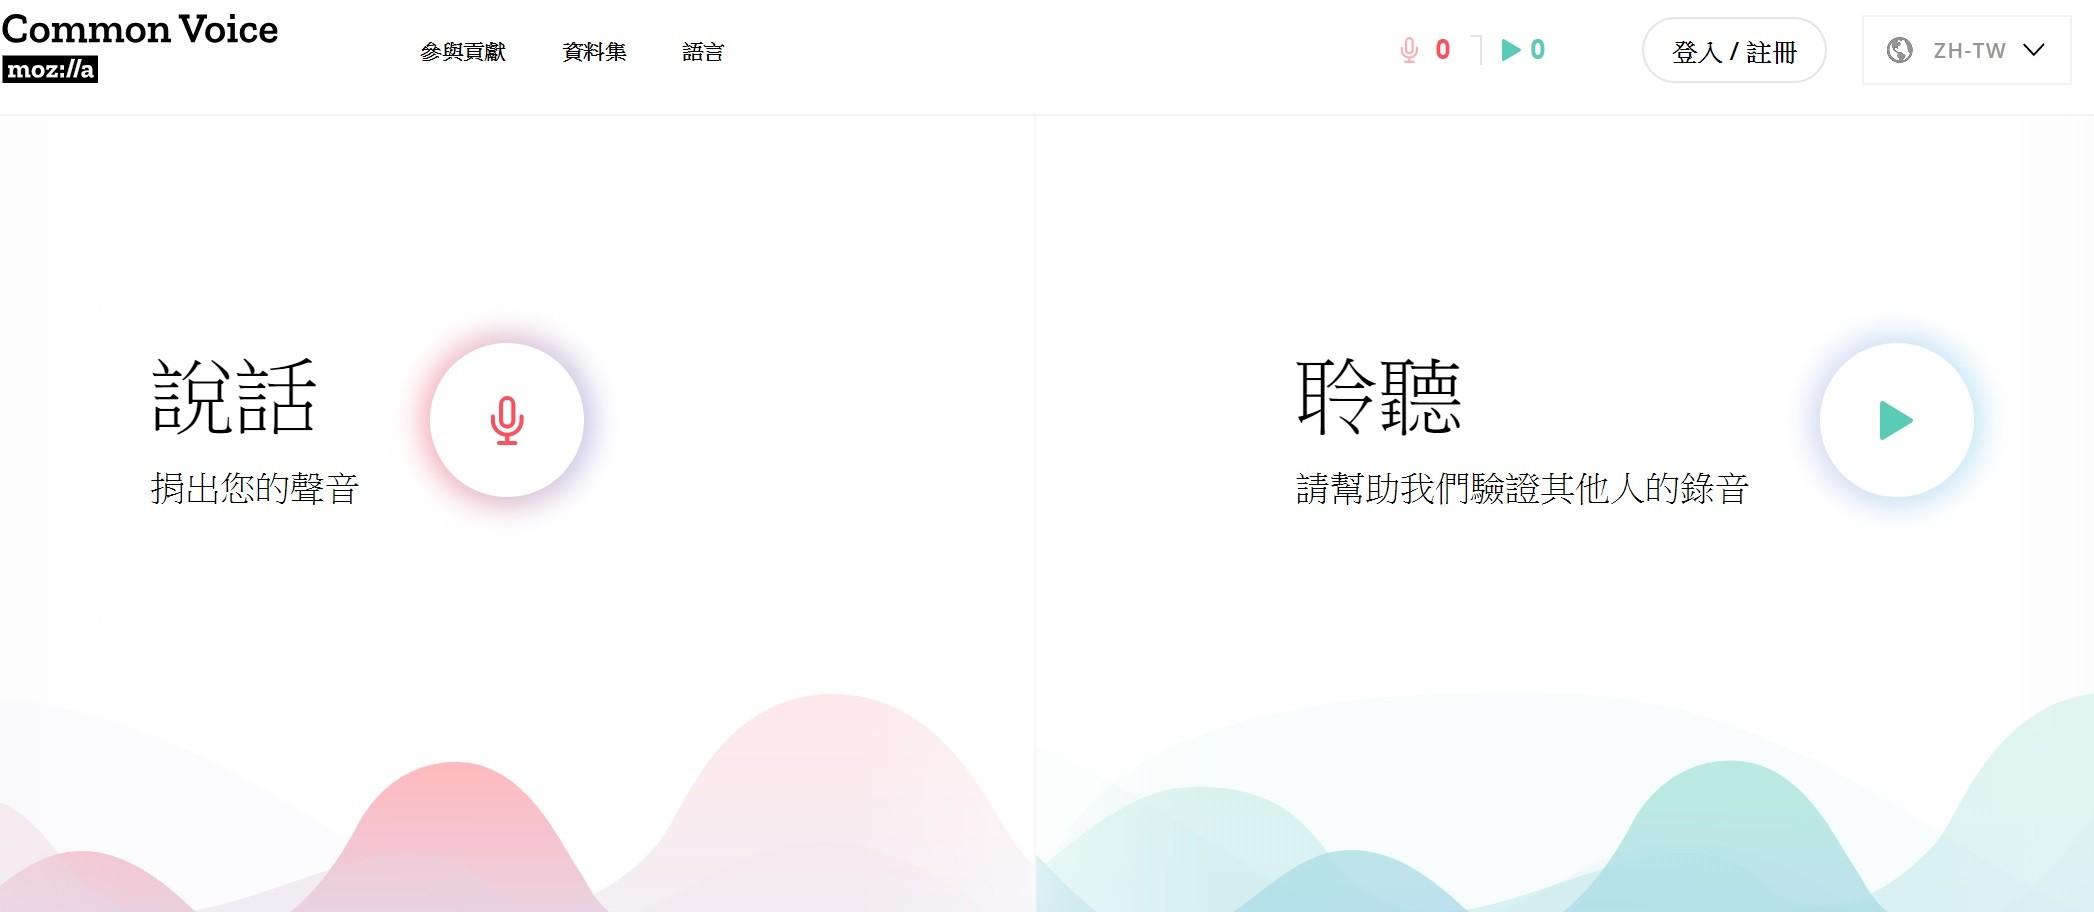 Logo, Screenshot, Product, Line, Design, Product design, Desktop Wallpaper, Angle, Brand, Computer, website, Text, Font, Line, Circle, Screenshot, Sky, Design, Diagram, Graphic design, Graphics